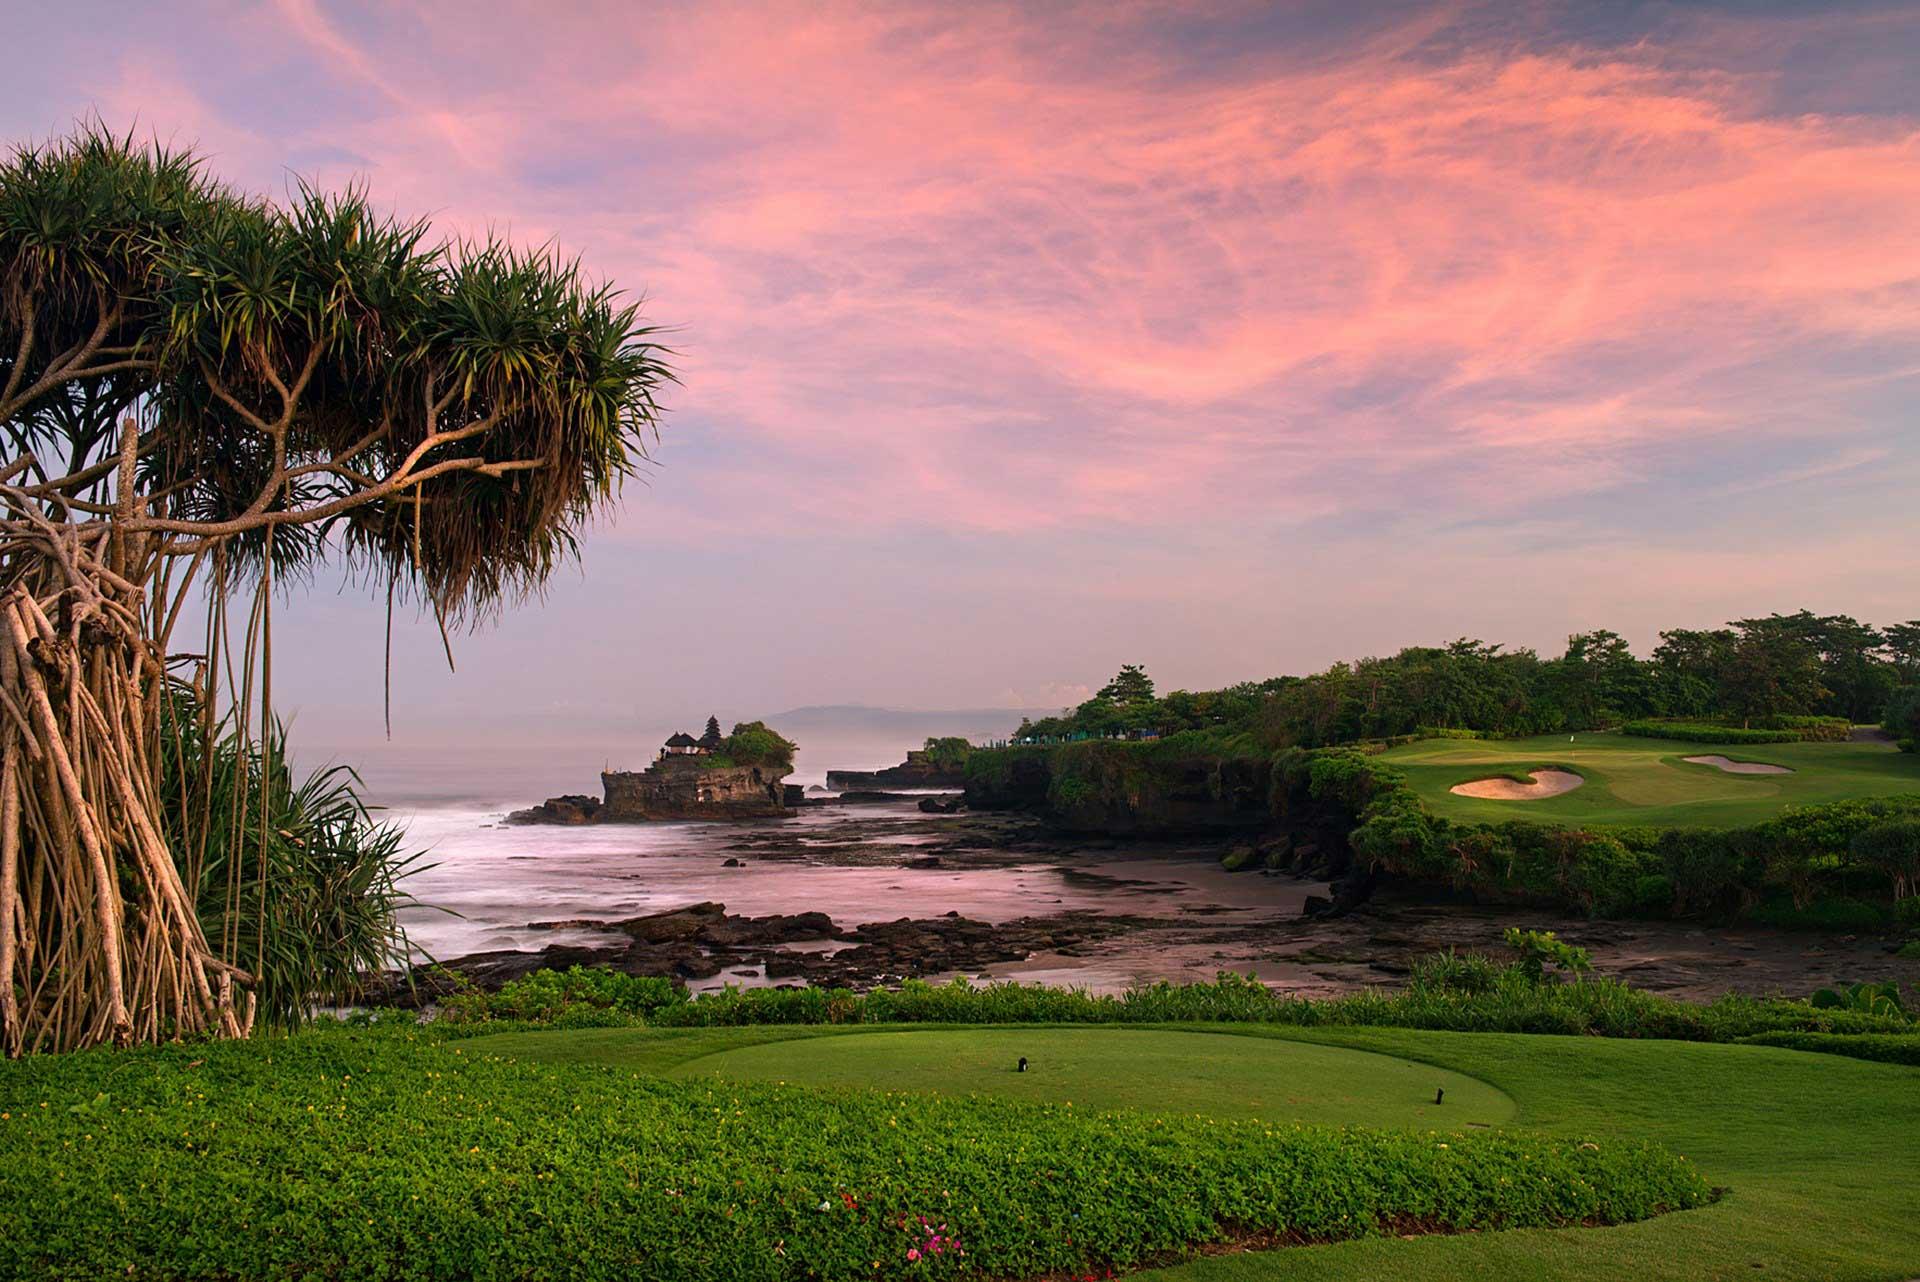 Bali Nirvana Golf Resort